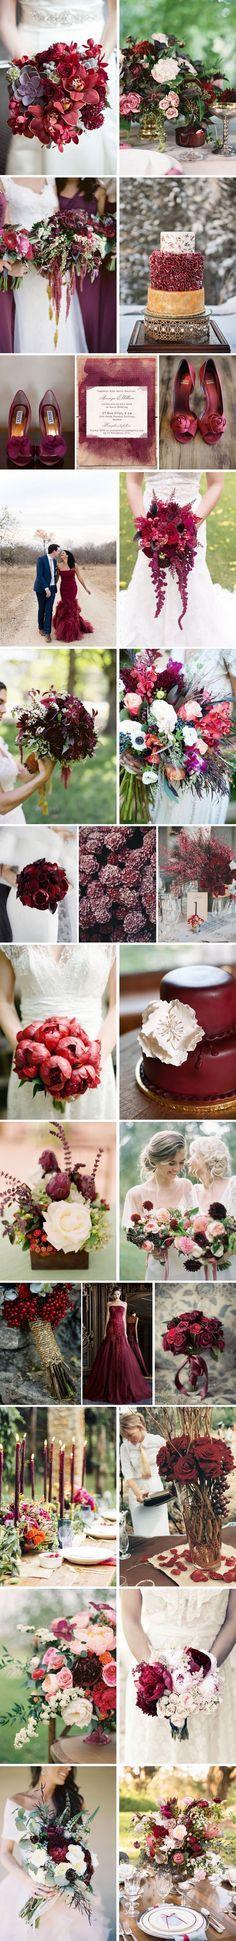 35 {Aubergine and Marsala} Classic Fall Wedding Color Ideas | http://www.deerpearlflowers.com/35-aubergine-marsala-classic-fall-wedding-color-ideas/